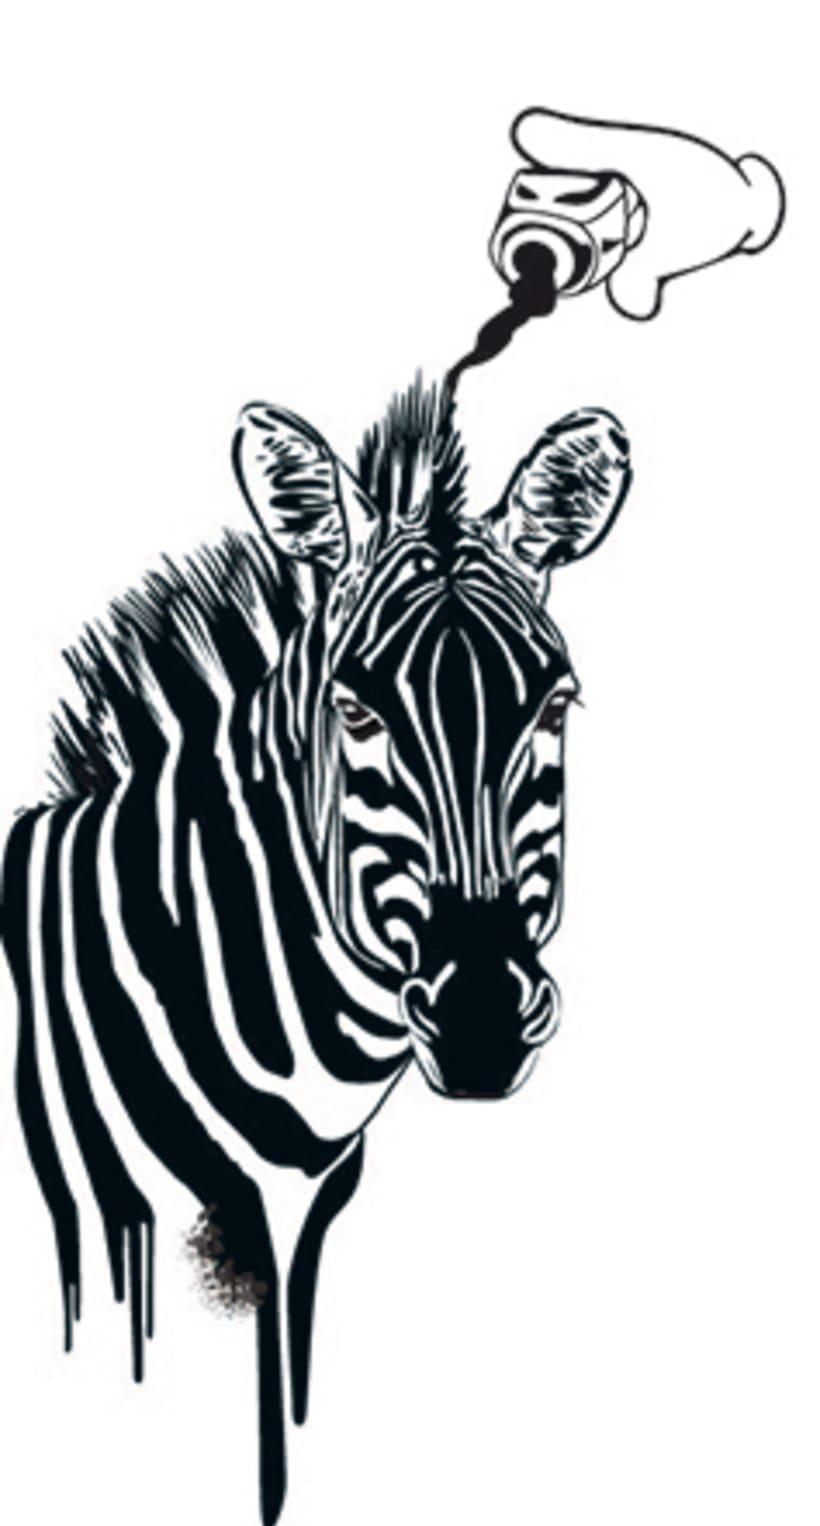 cebra illustrator -1